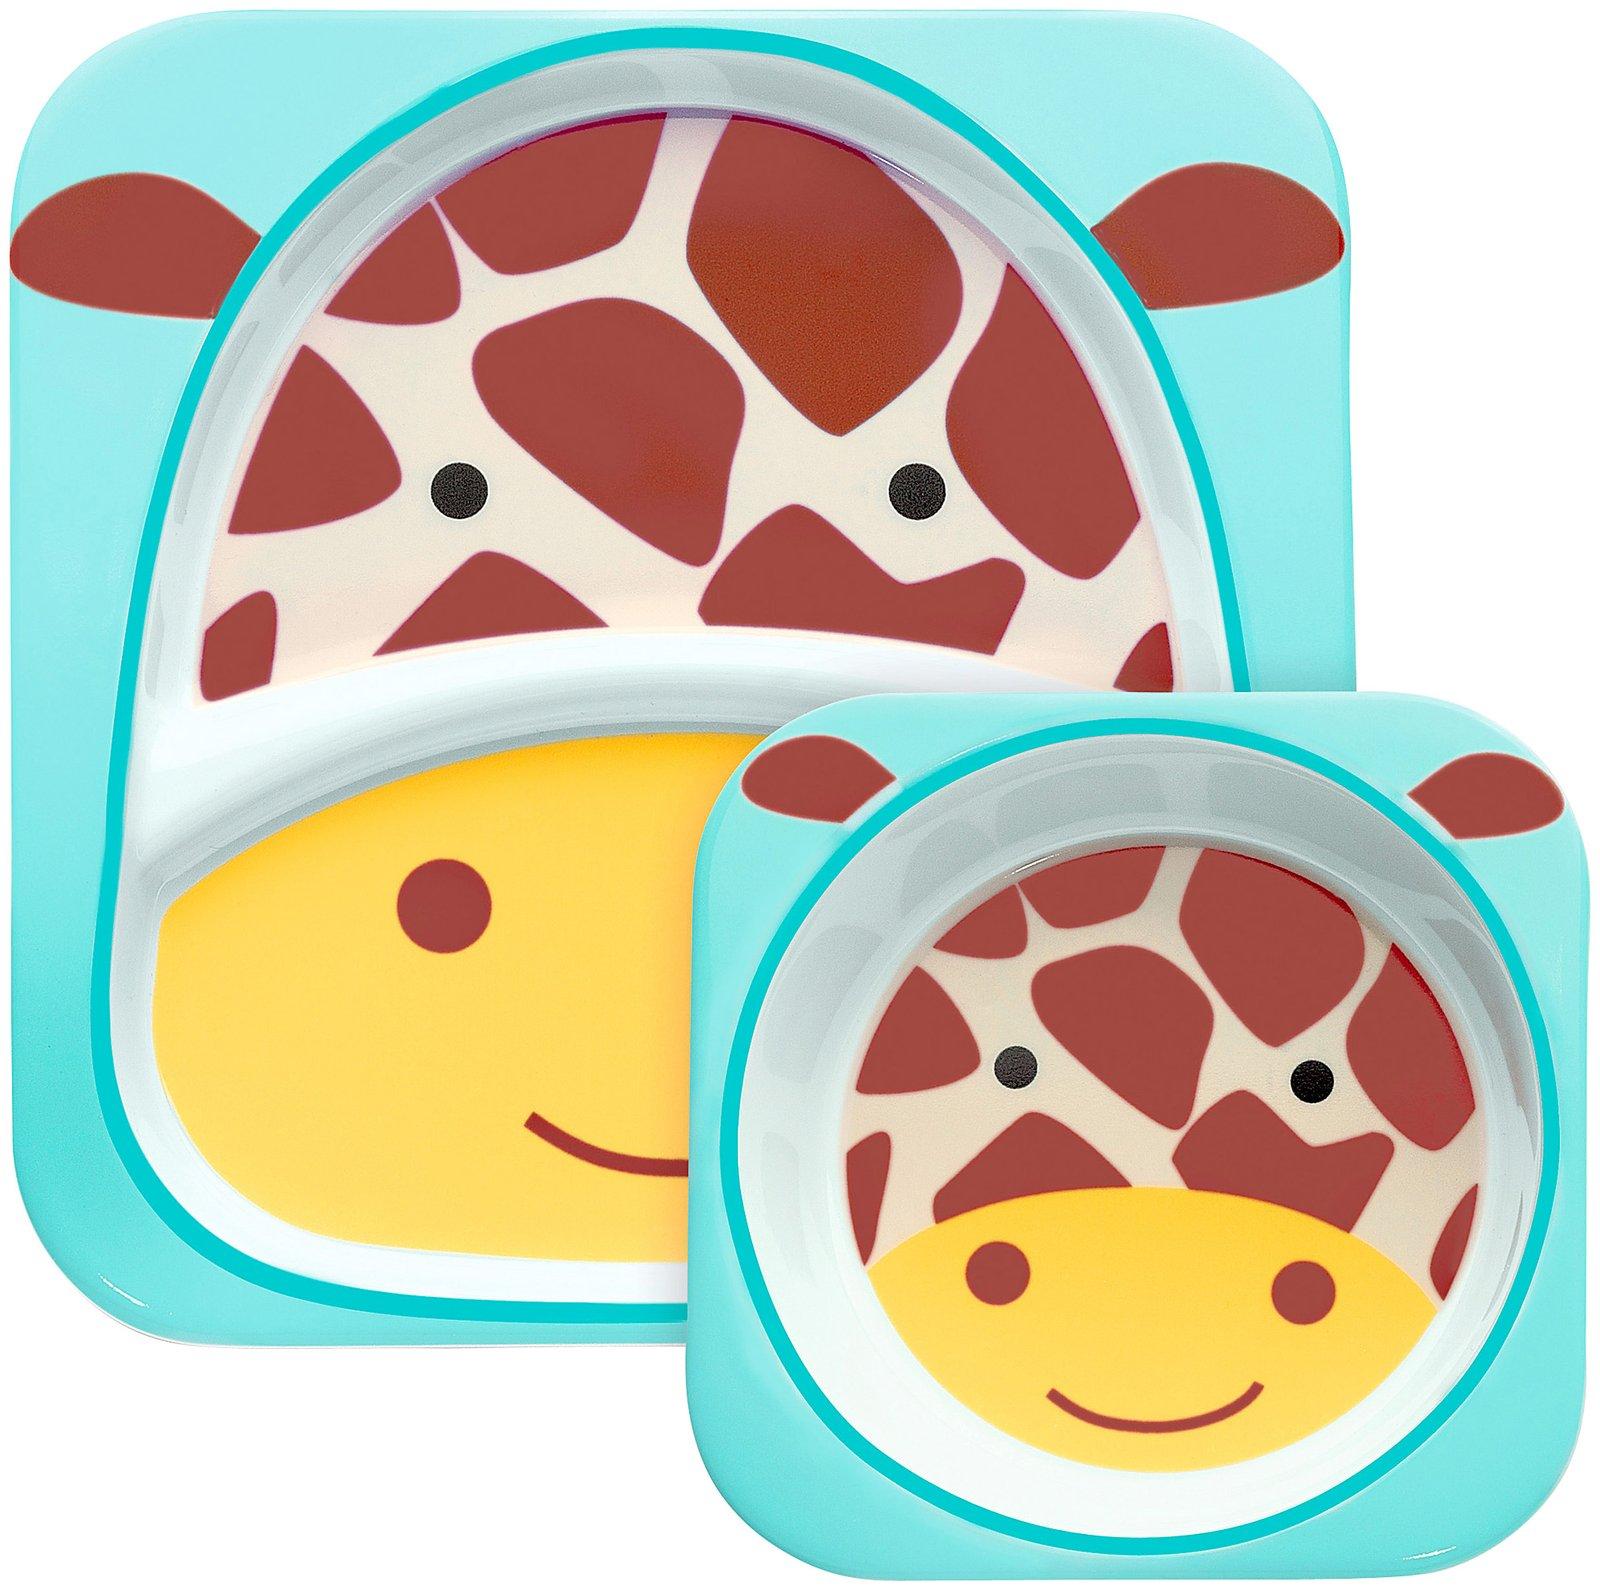 Skip Hop Zoo Melamine Plate and Bowl Set - Giraffe